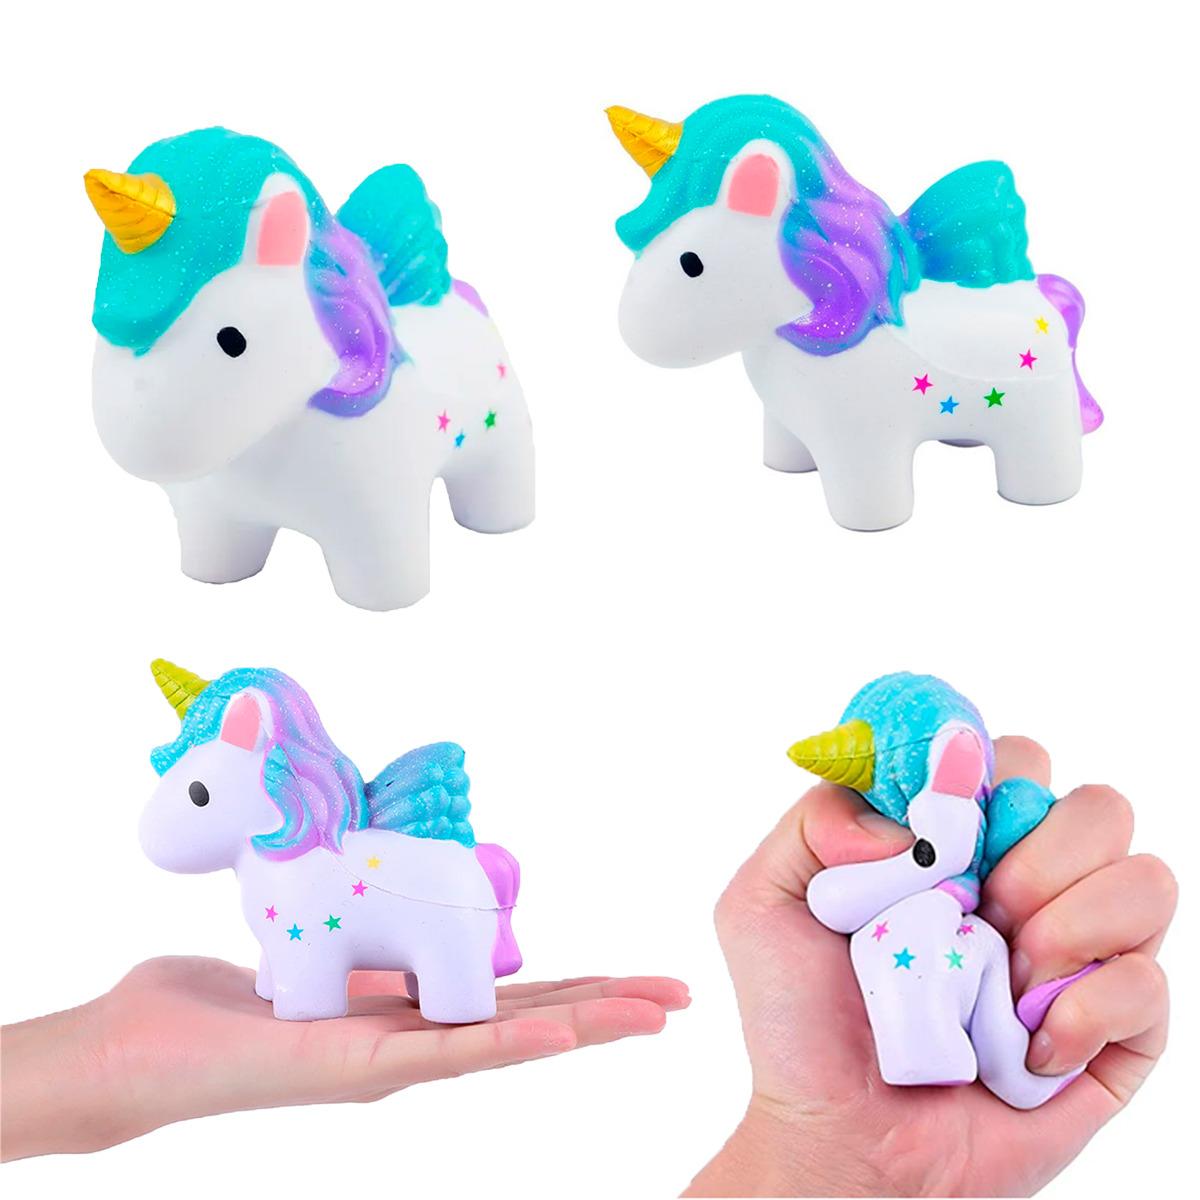 Squishy Unicornio Juguete Kawaii Almohada Anti Estrés 1Pz